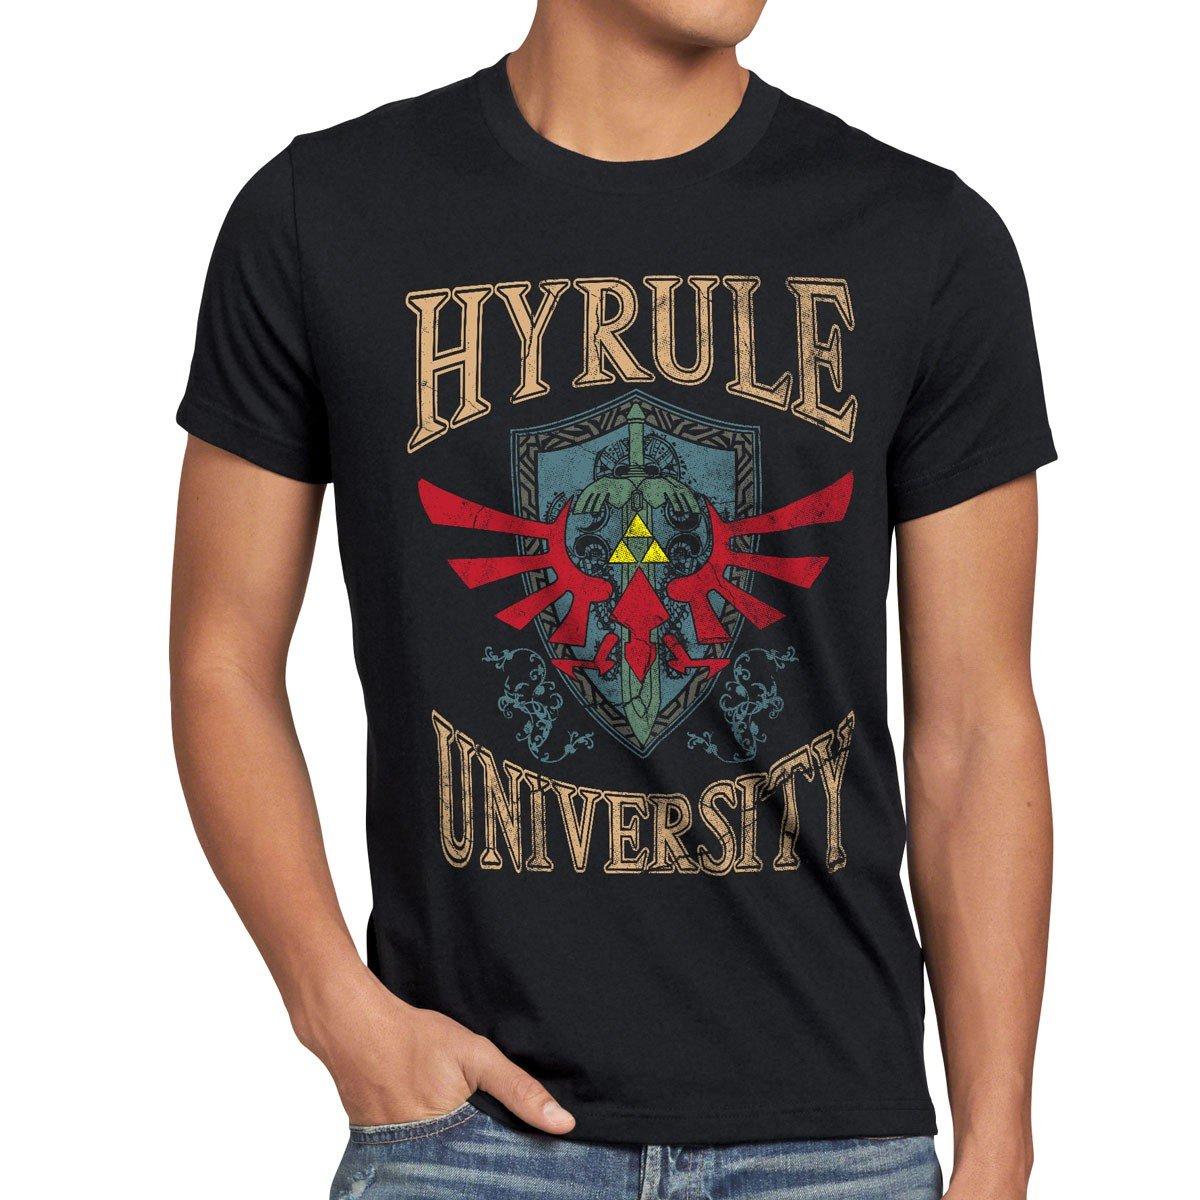 Camisetas La Colmena 682-Hyrule Univeristy (Arinesart) QMTdbz